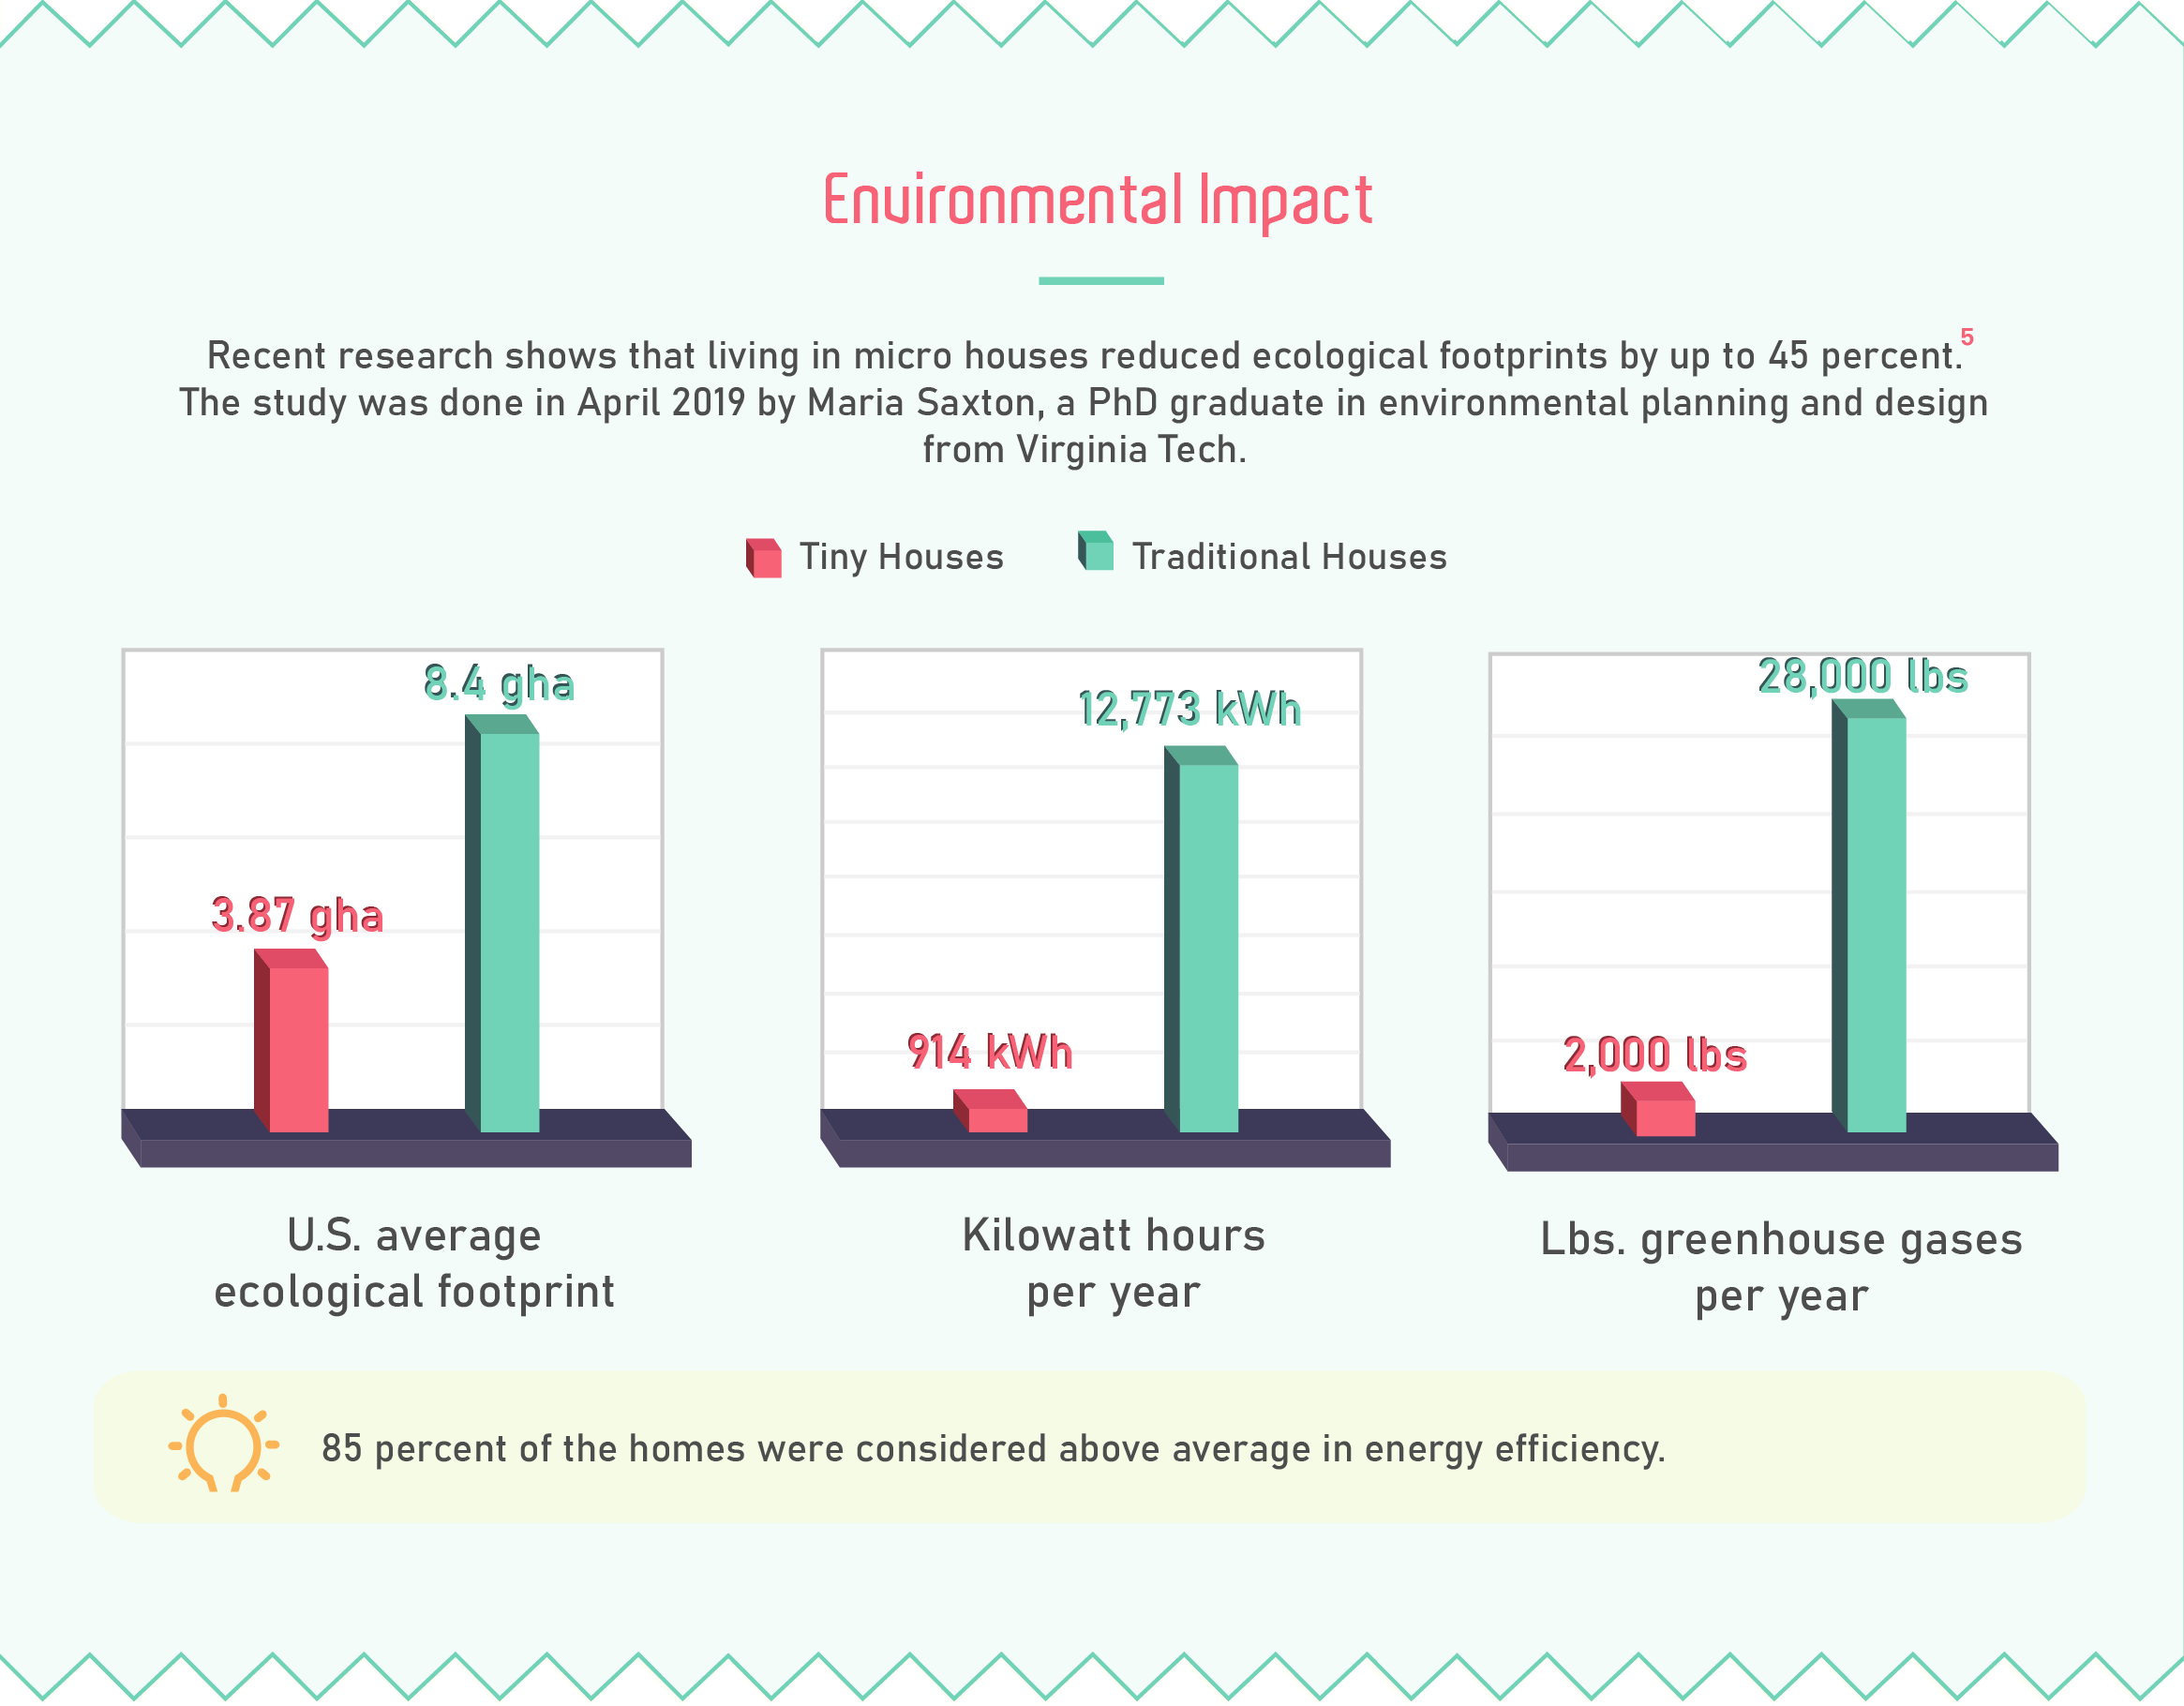 Environmental impact of tiny homes vs traditional houses